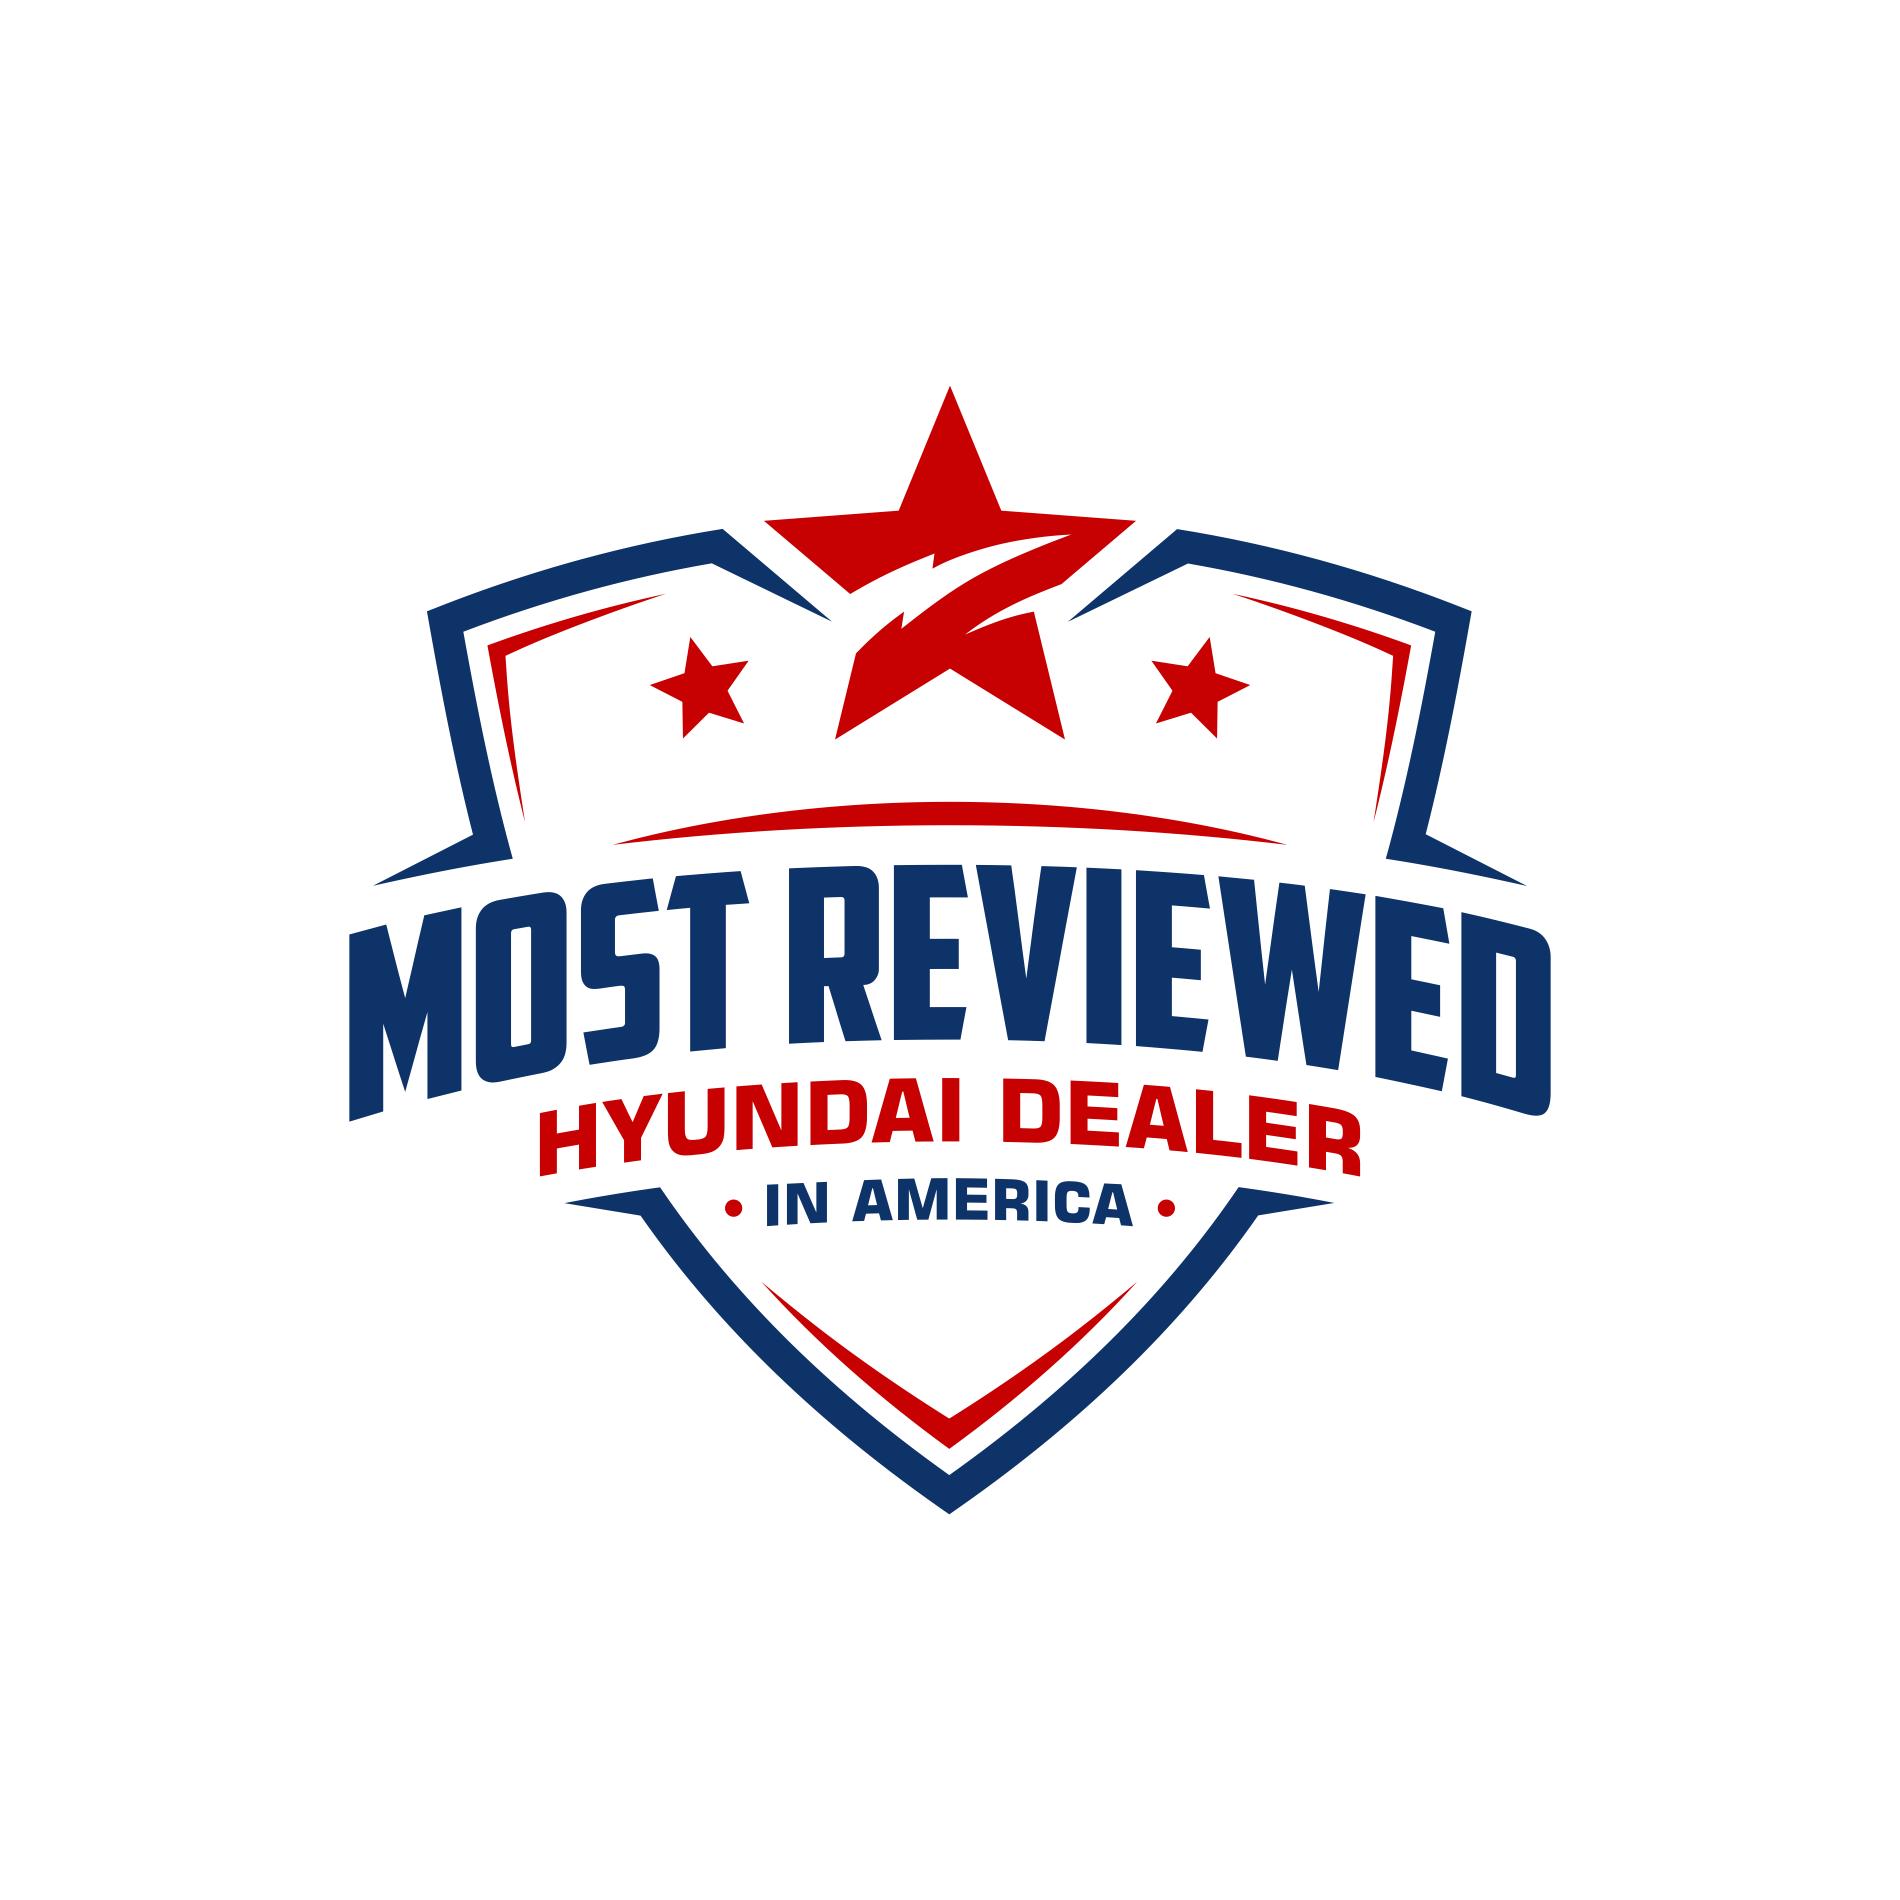 Design a creative badge logo for Most Reviewed Hyundai Dealer in America